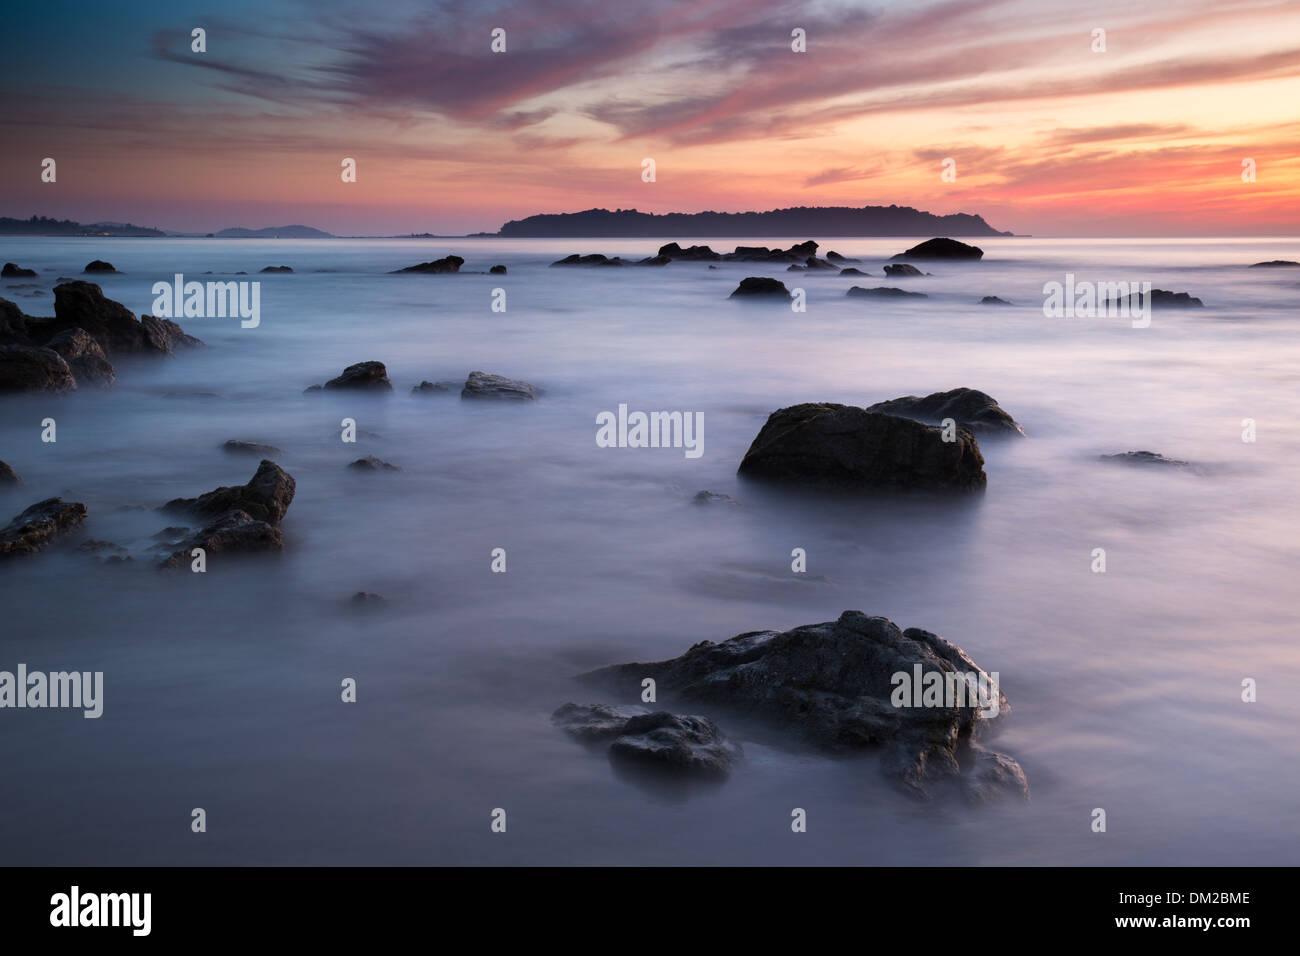 Ngapali Beach, Rakhine, Myanmar (Burma) - Stock Image